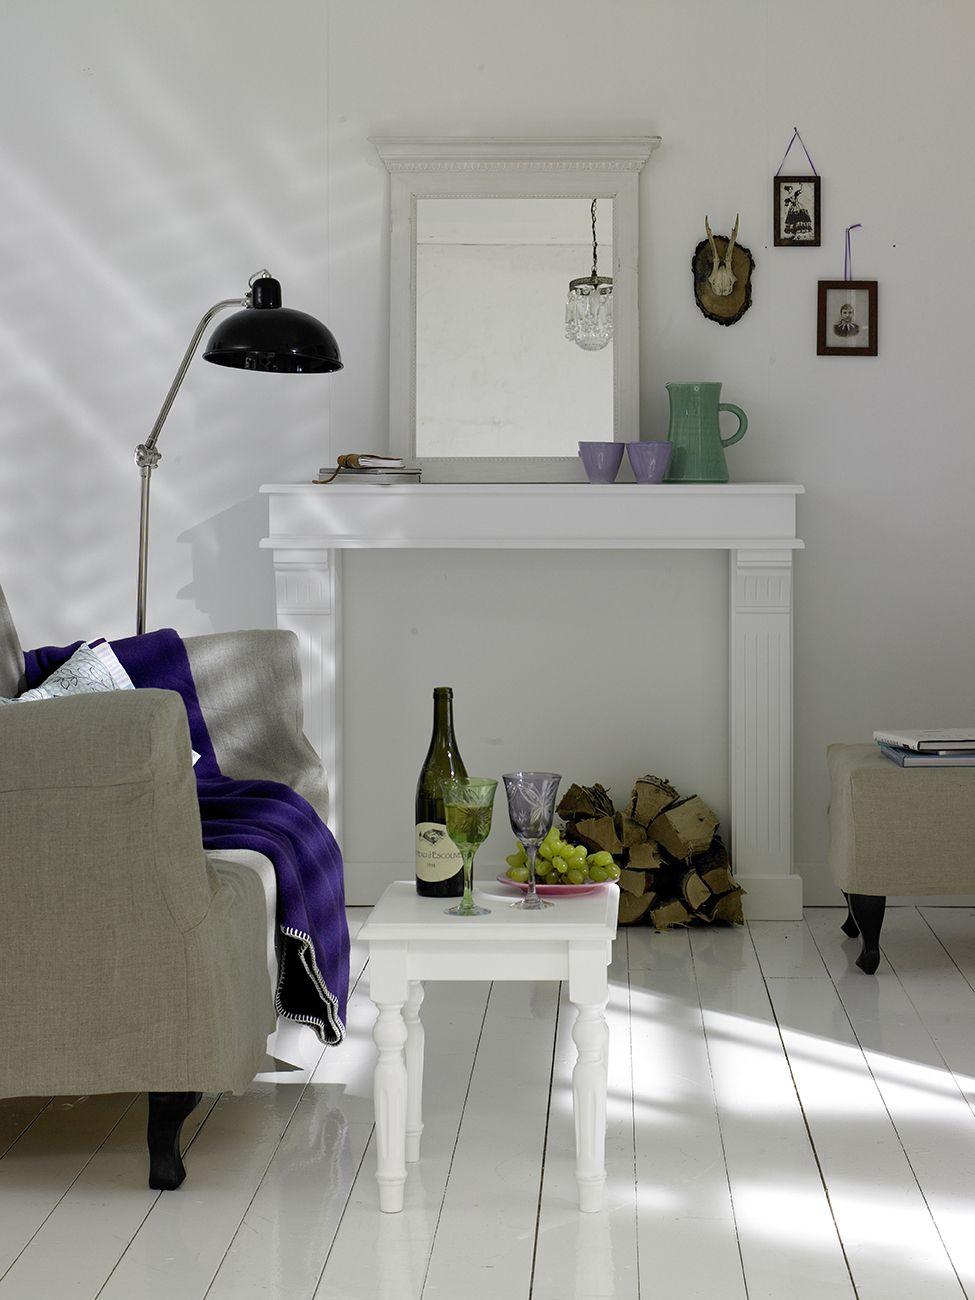 kaminatrappe-weiss | Living room | Pinterest | Kaminkonsole ...